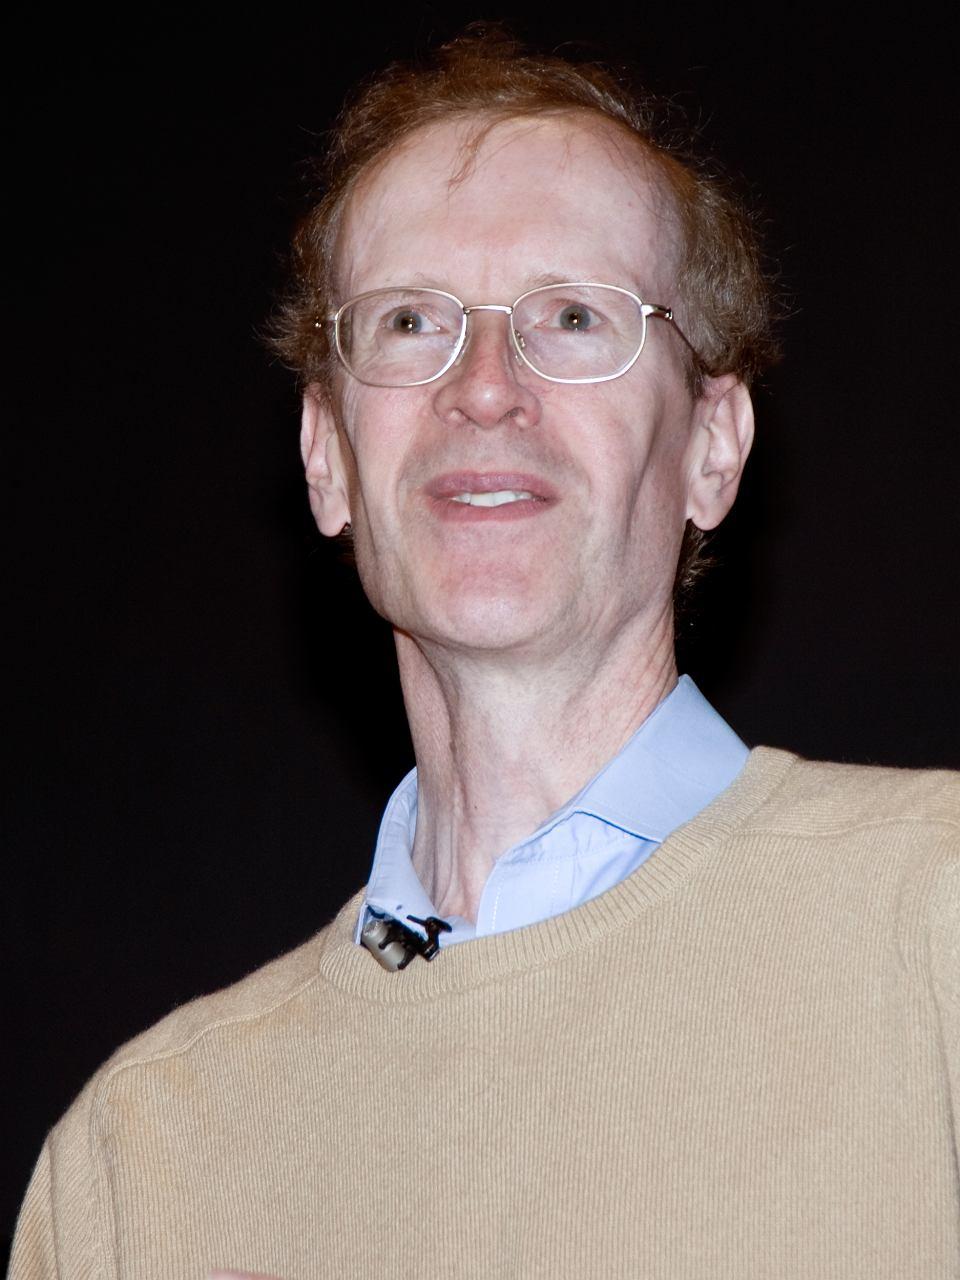 Andrew John Wiles, brytyjski matematyk, profesor Oxfordu, laureat Nagrody Abela w 2016 roku